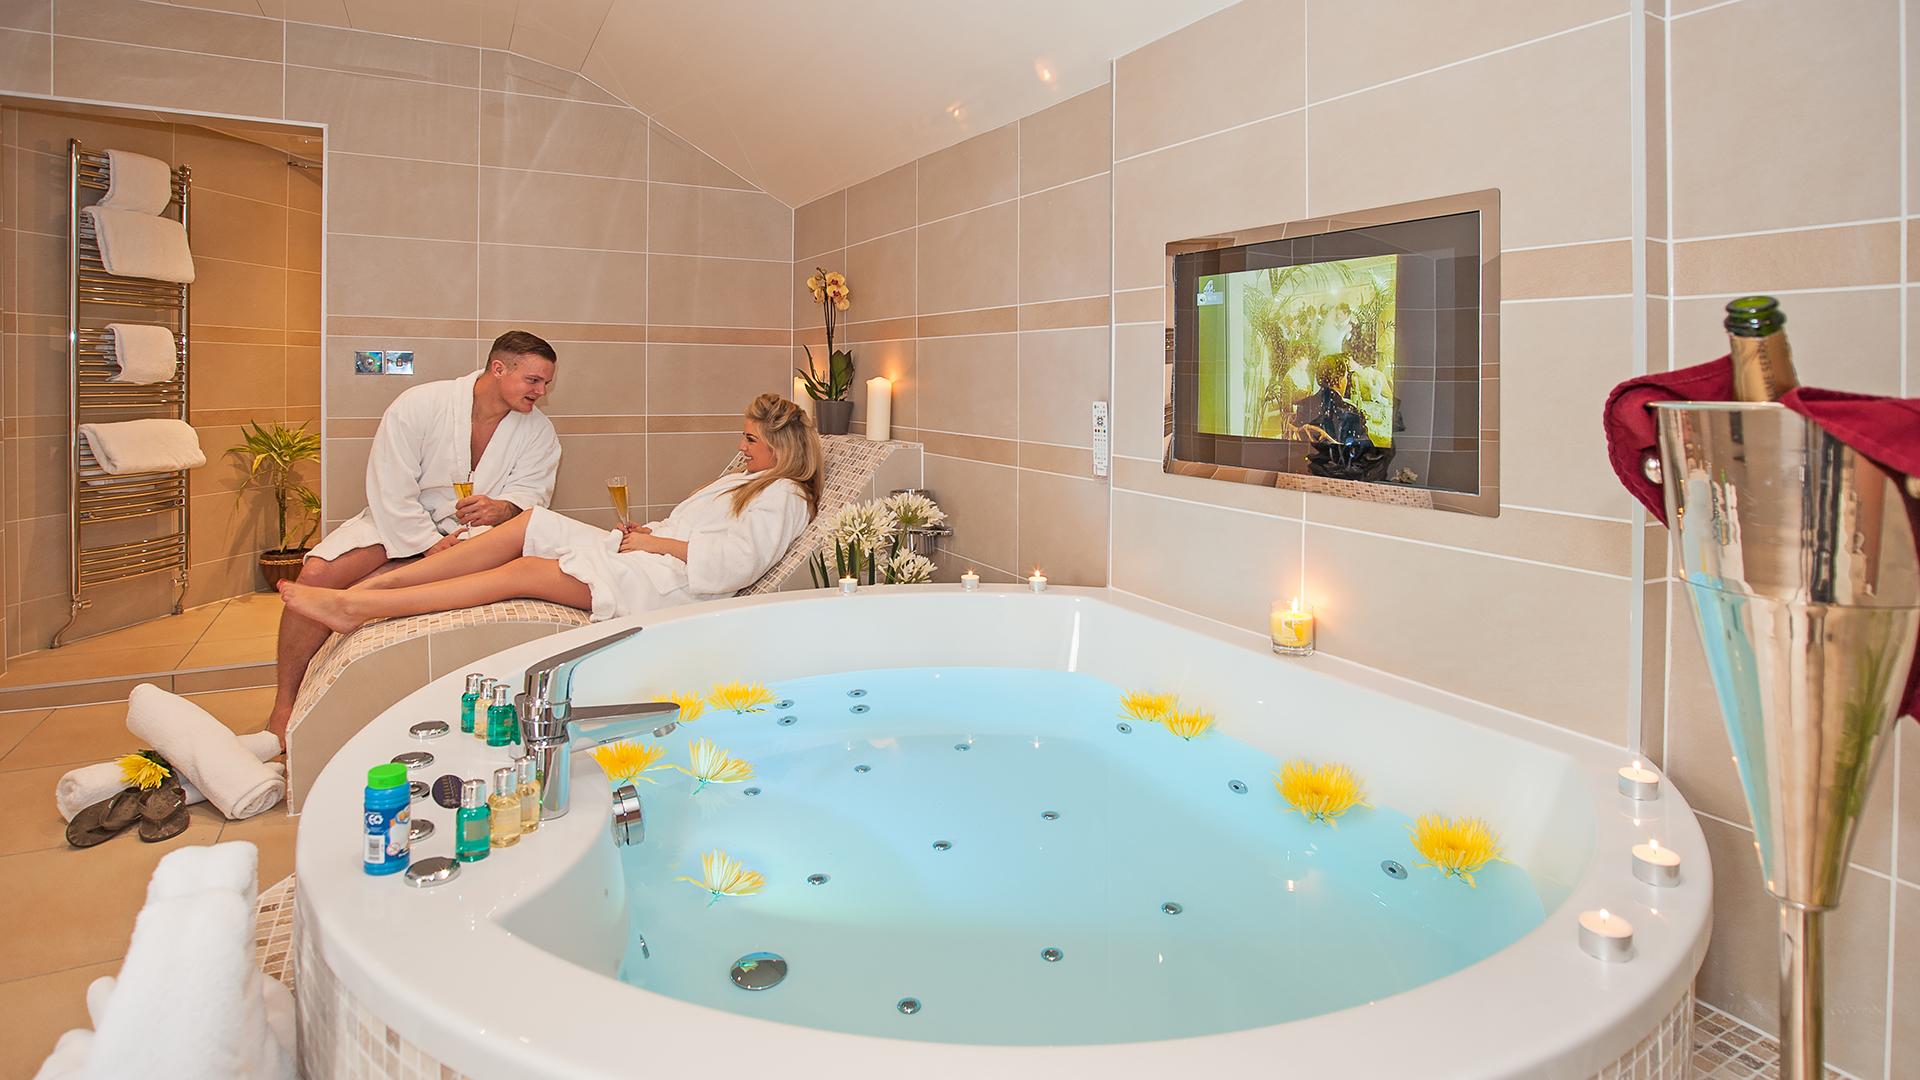 Couple in Bathrobes Beside Giant Luxury Hotel Spa Bath